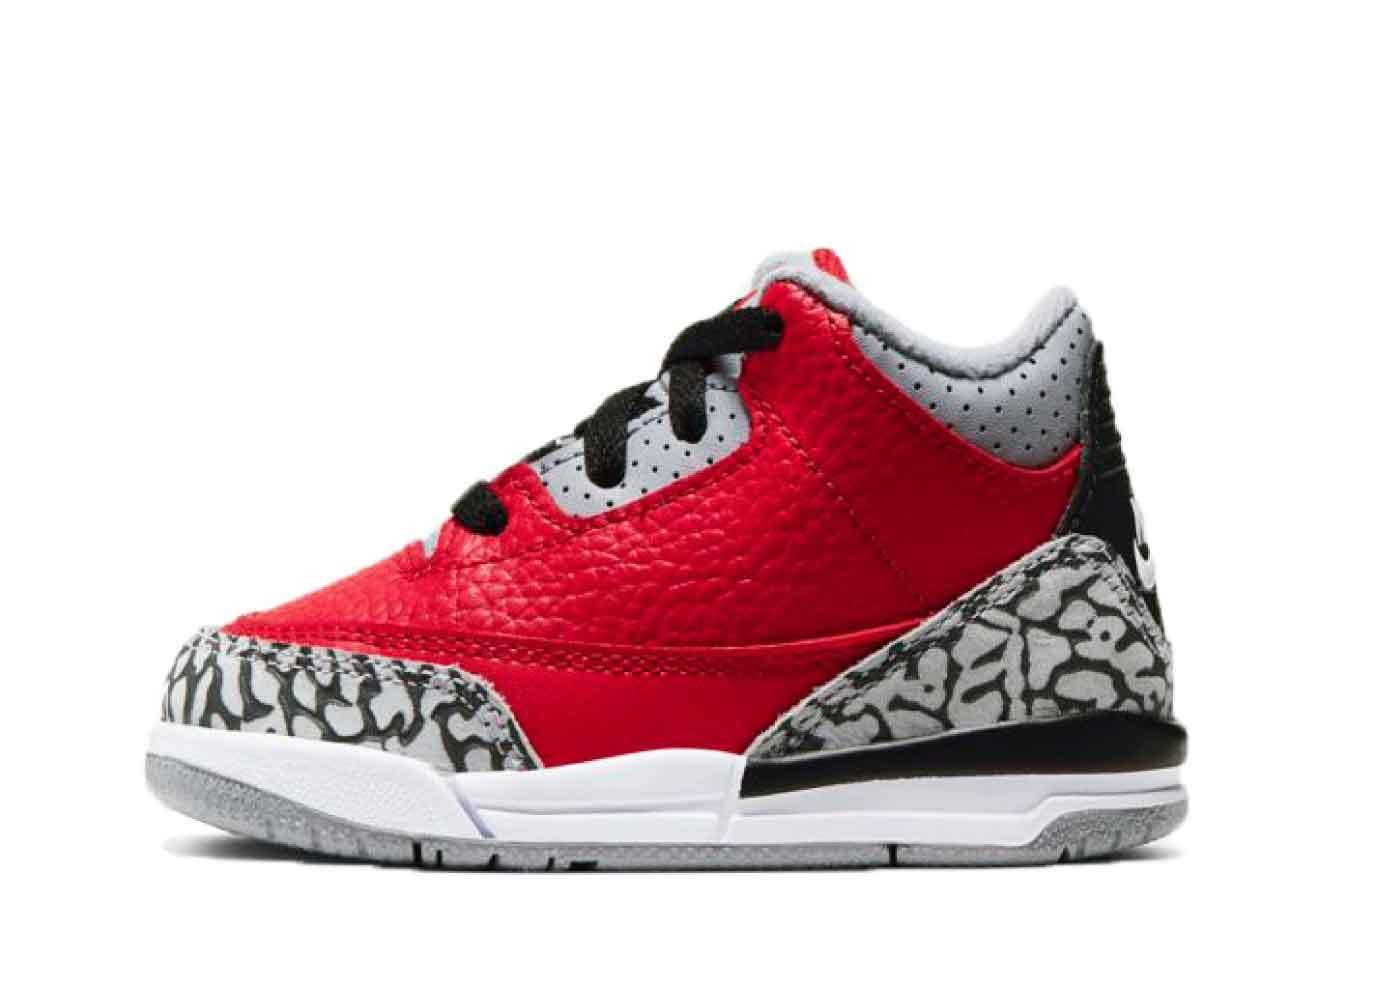 Nike Air Jordan 3 Retro Red Cement Infantsの写真